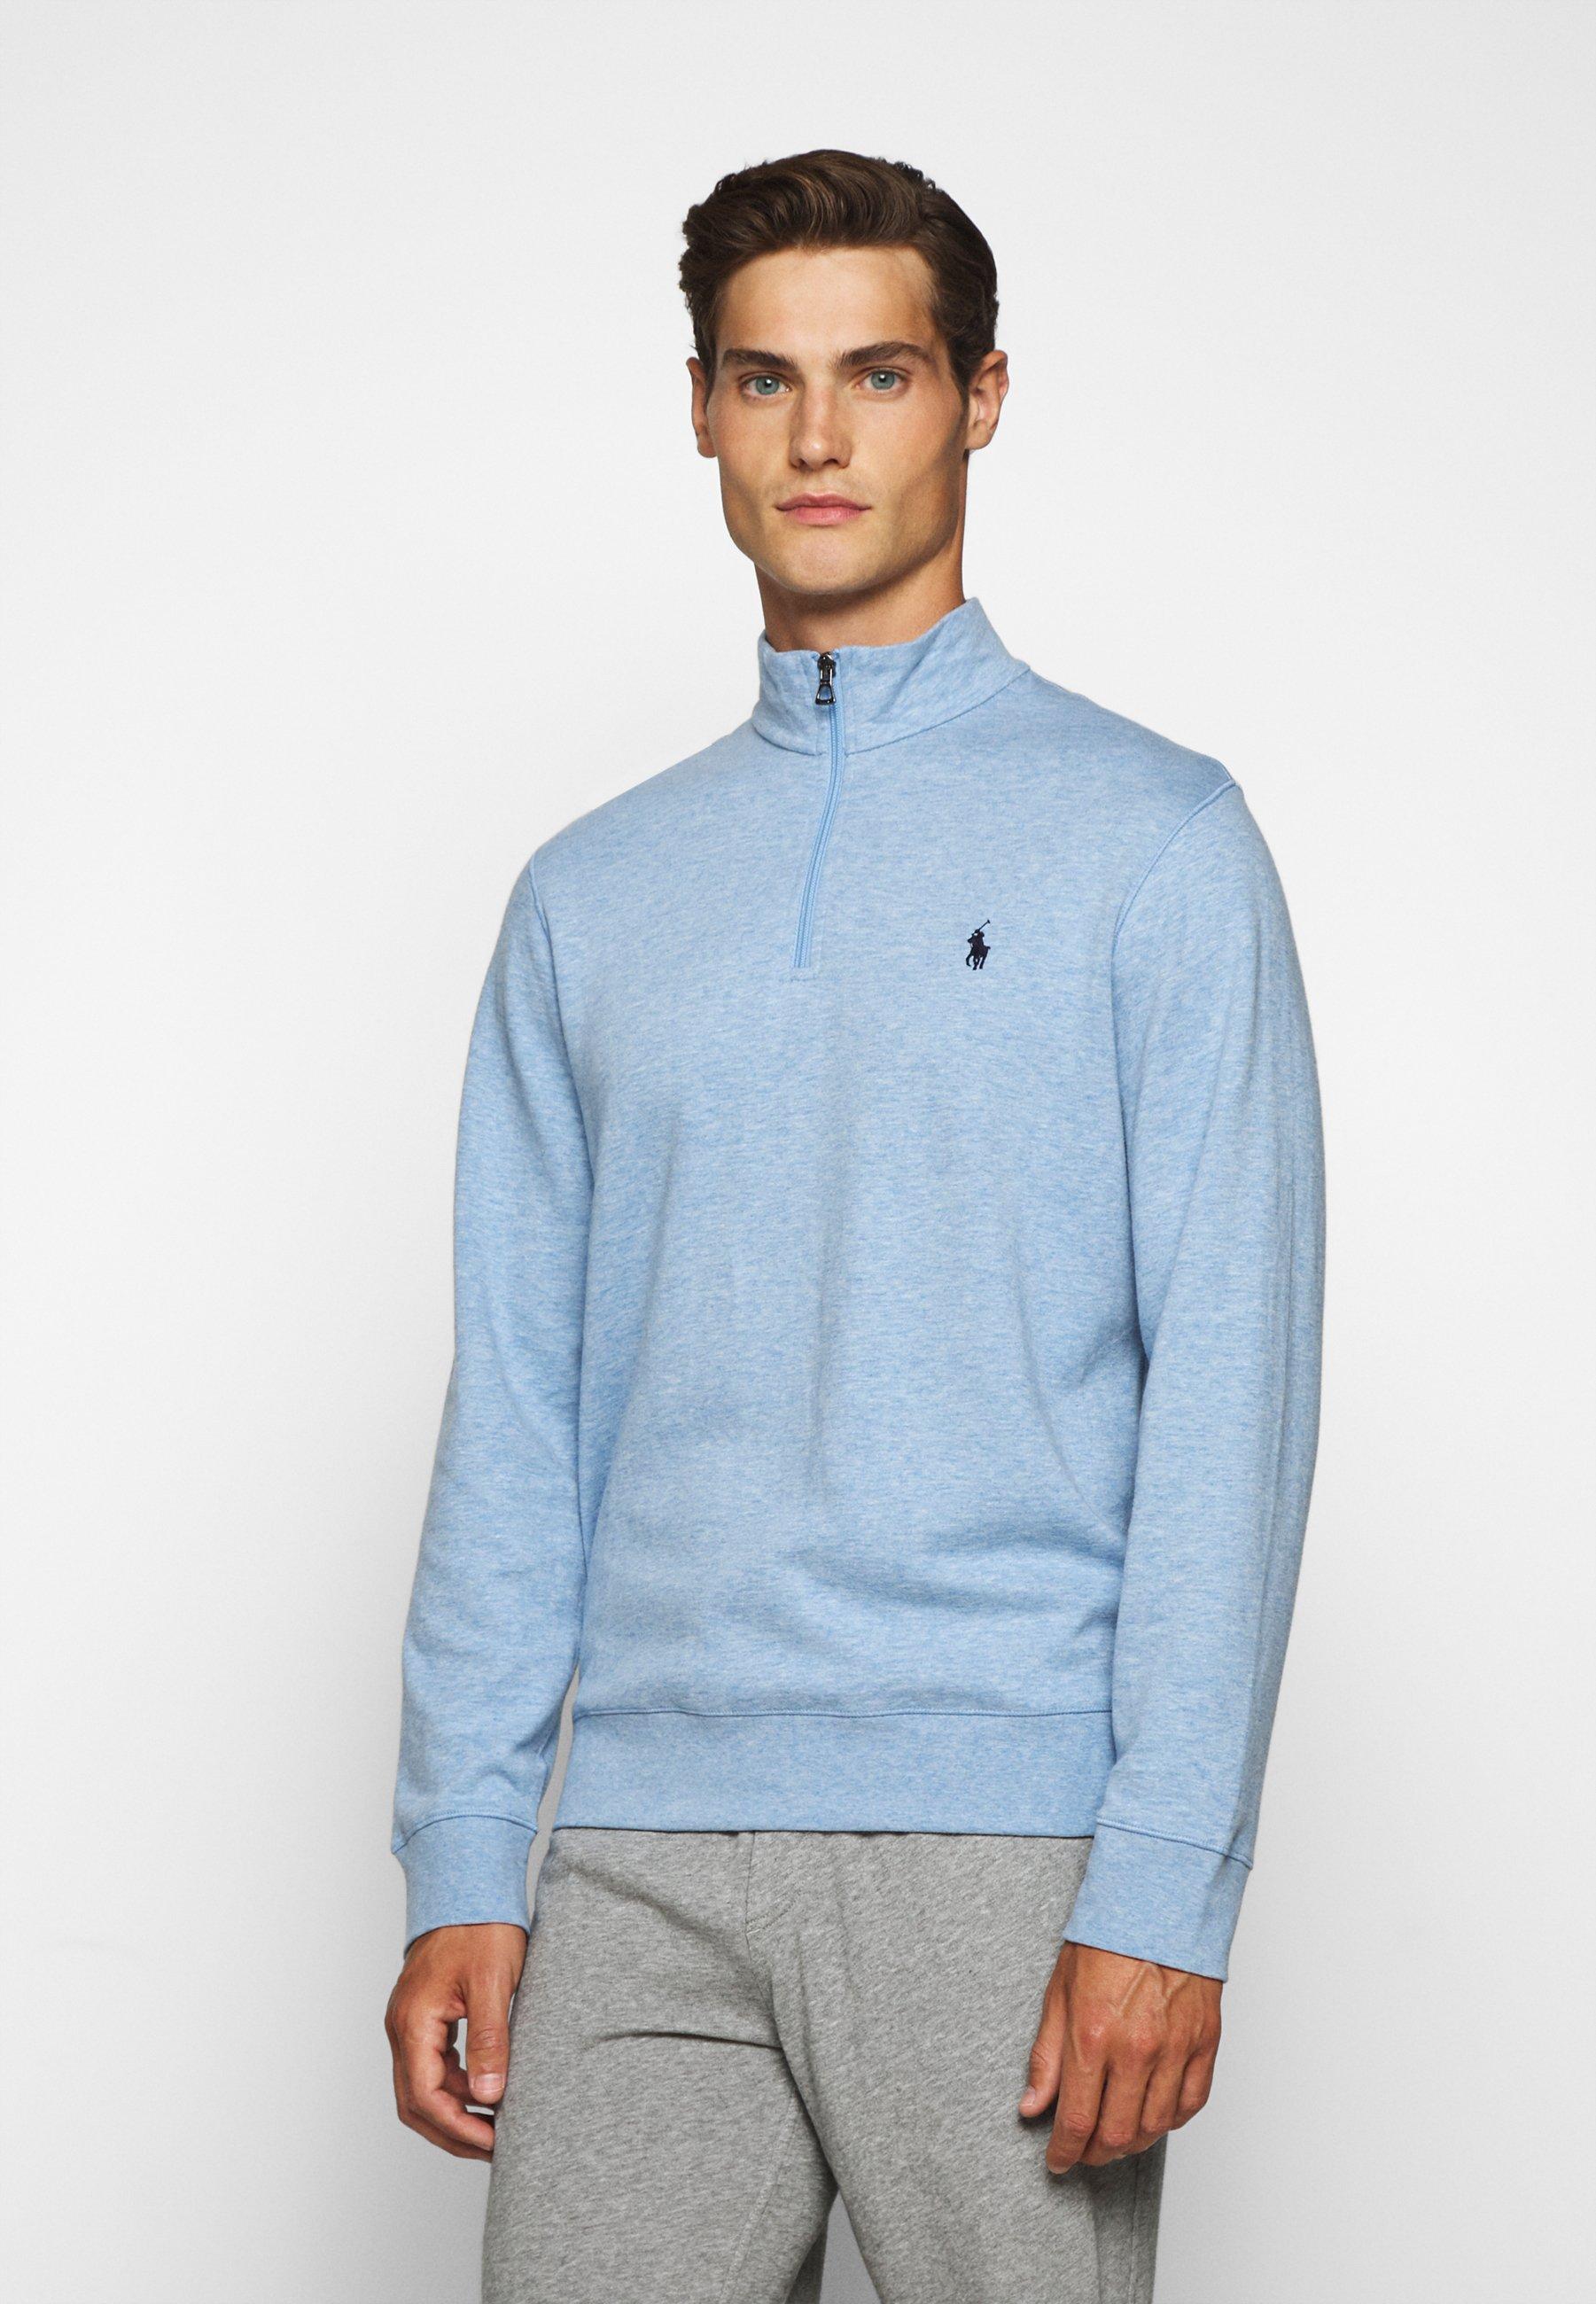 Polo Ralph Lauren Långärmad tröja - jamaica heather - Herrkläder Rabatter